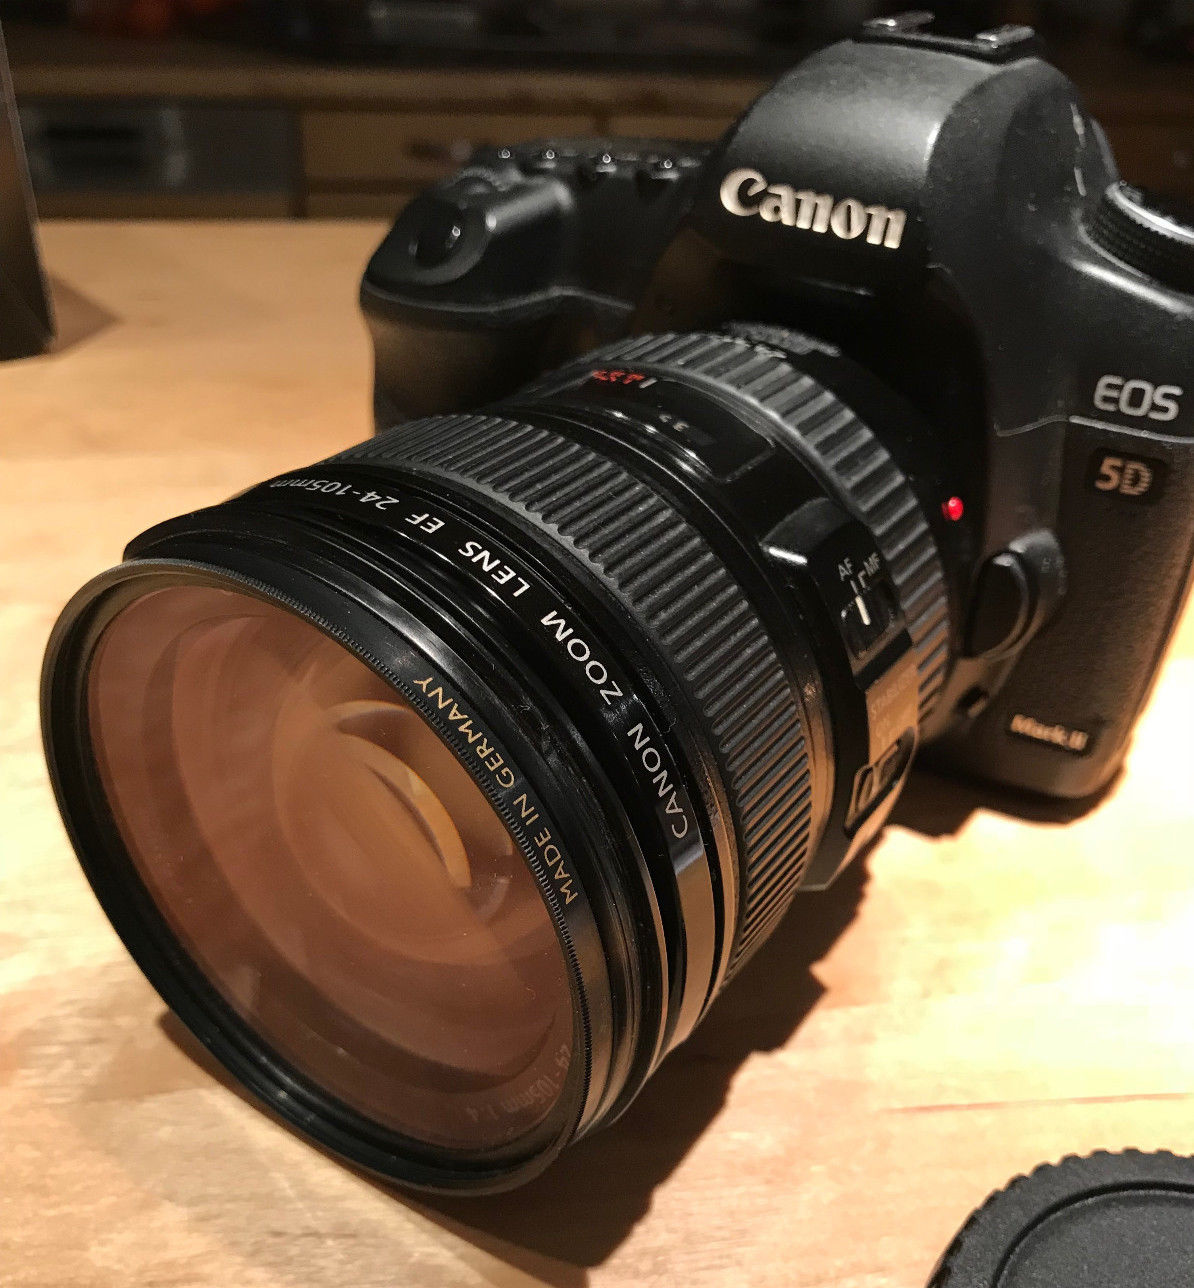 Canon EOS 6D 20.2 MP SLR-Digitalkamera - Schwarz (Kit m/ EF 24-105mm f/4.0L...